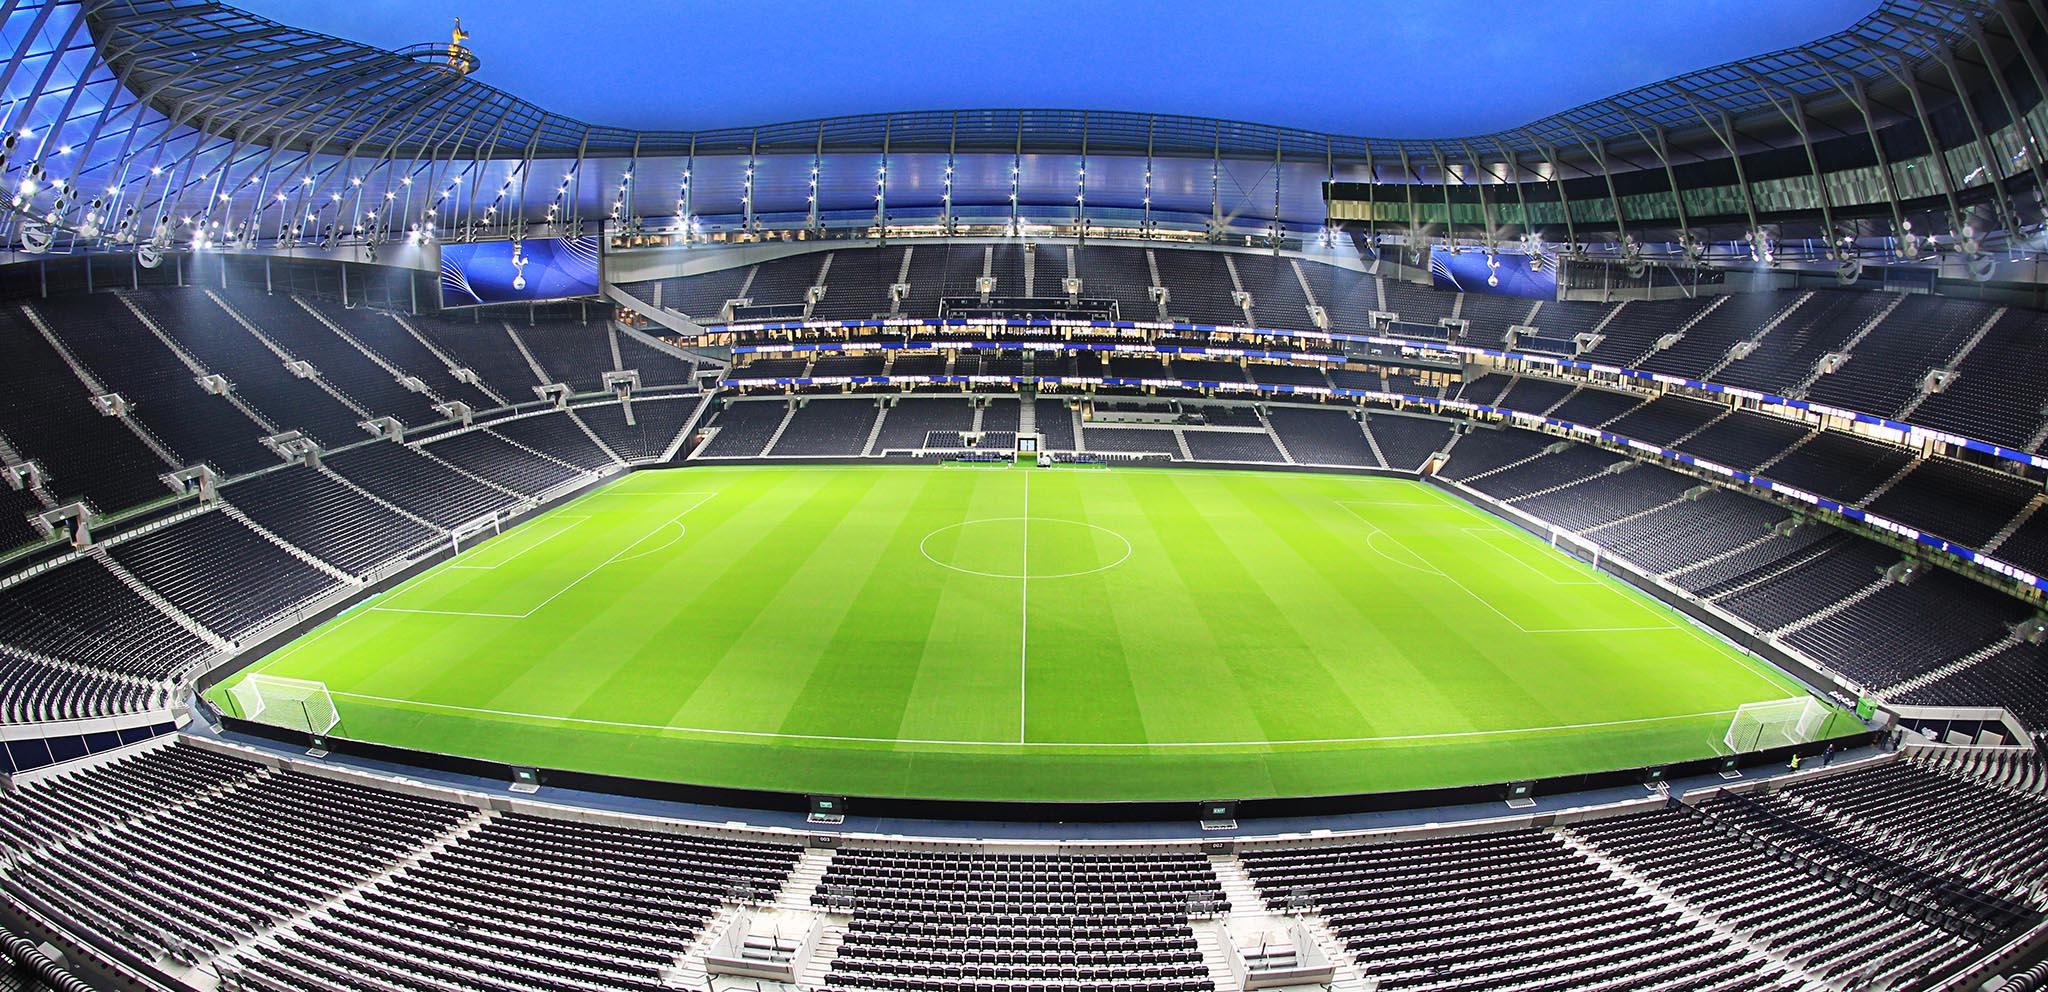 Tottenham Hotspur Stadium Tickets 2048x992 Wallpaper Teahub Io